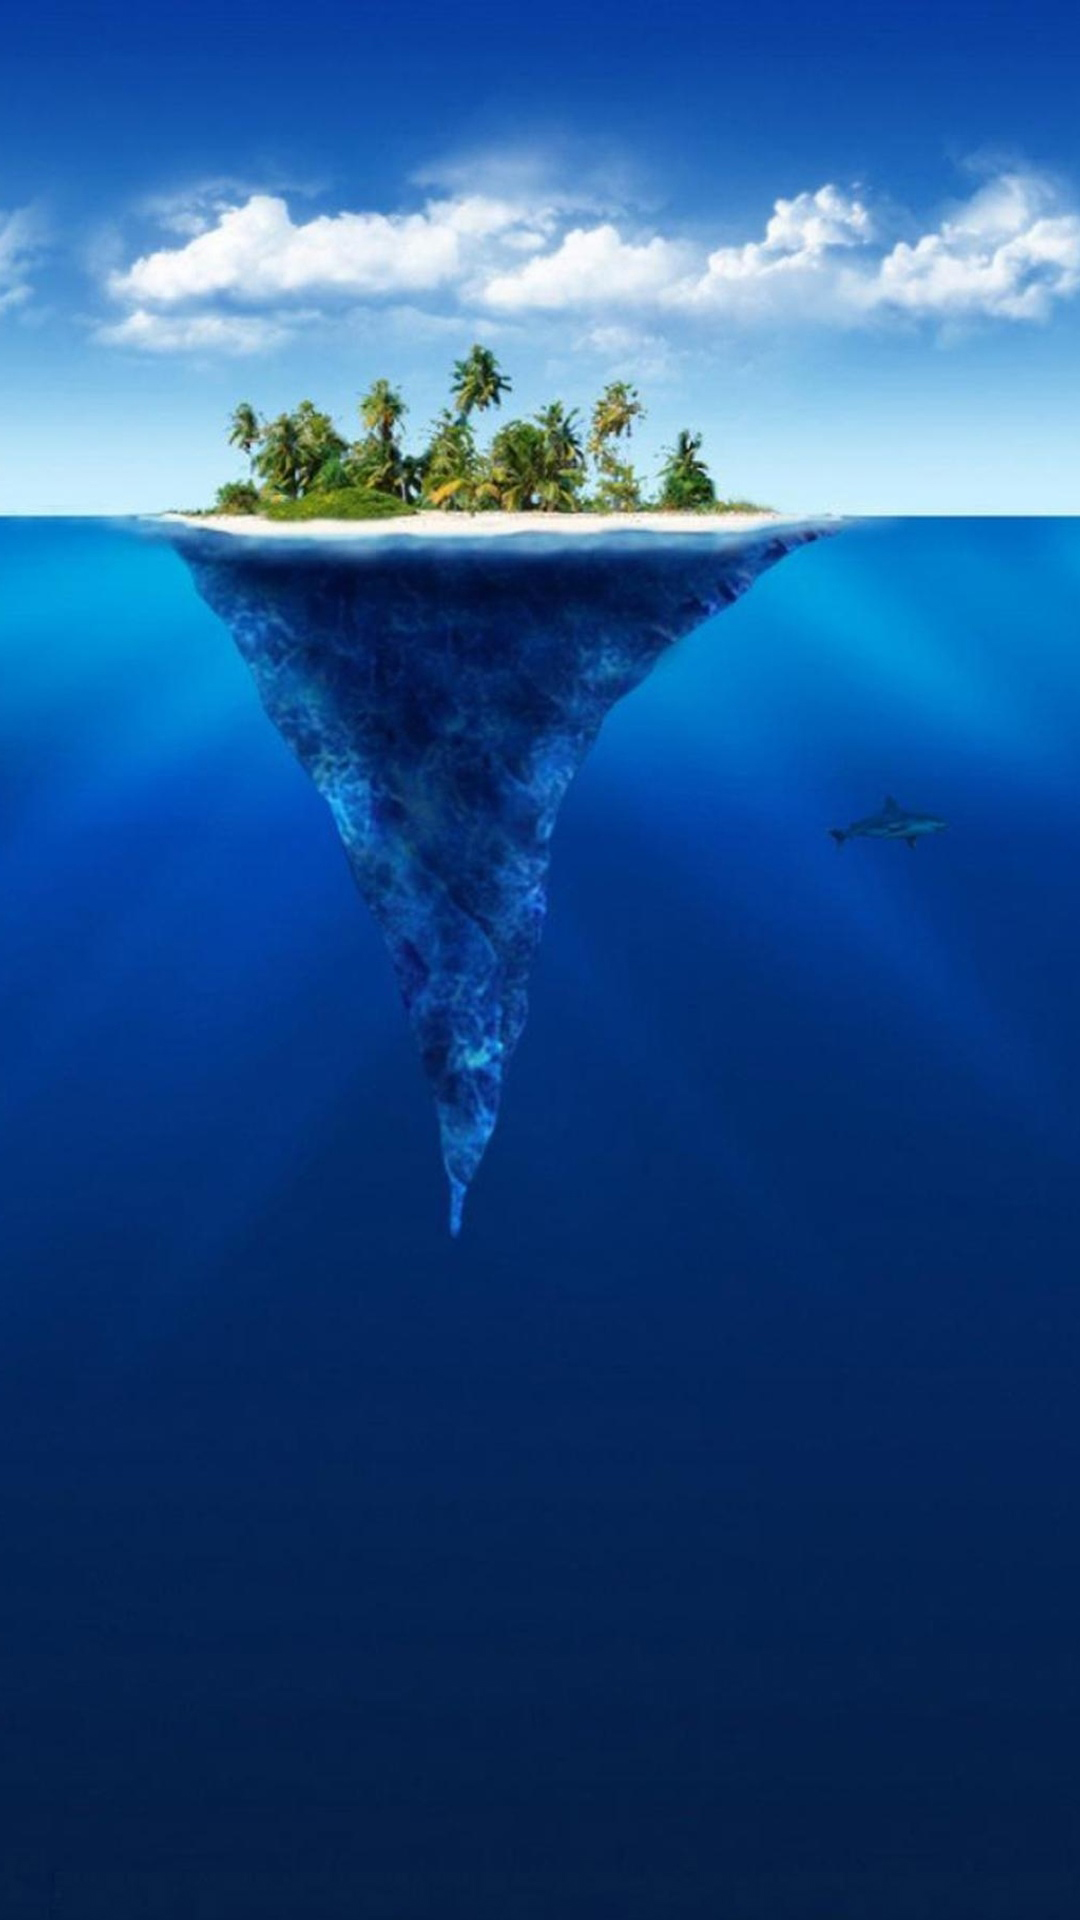 Tropical Island Desktop Wallpaper 1080x1920